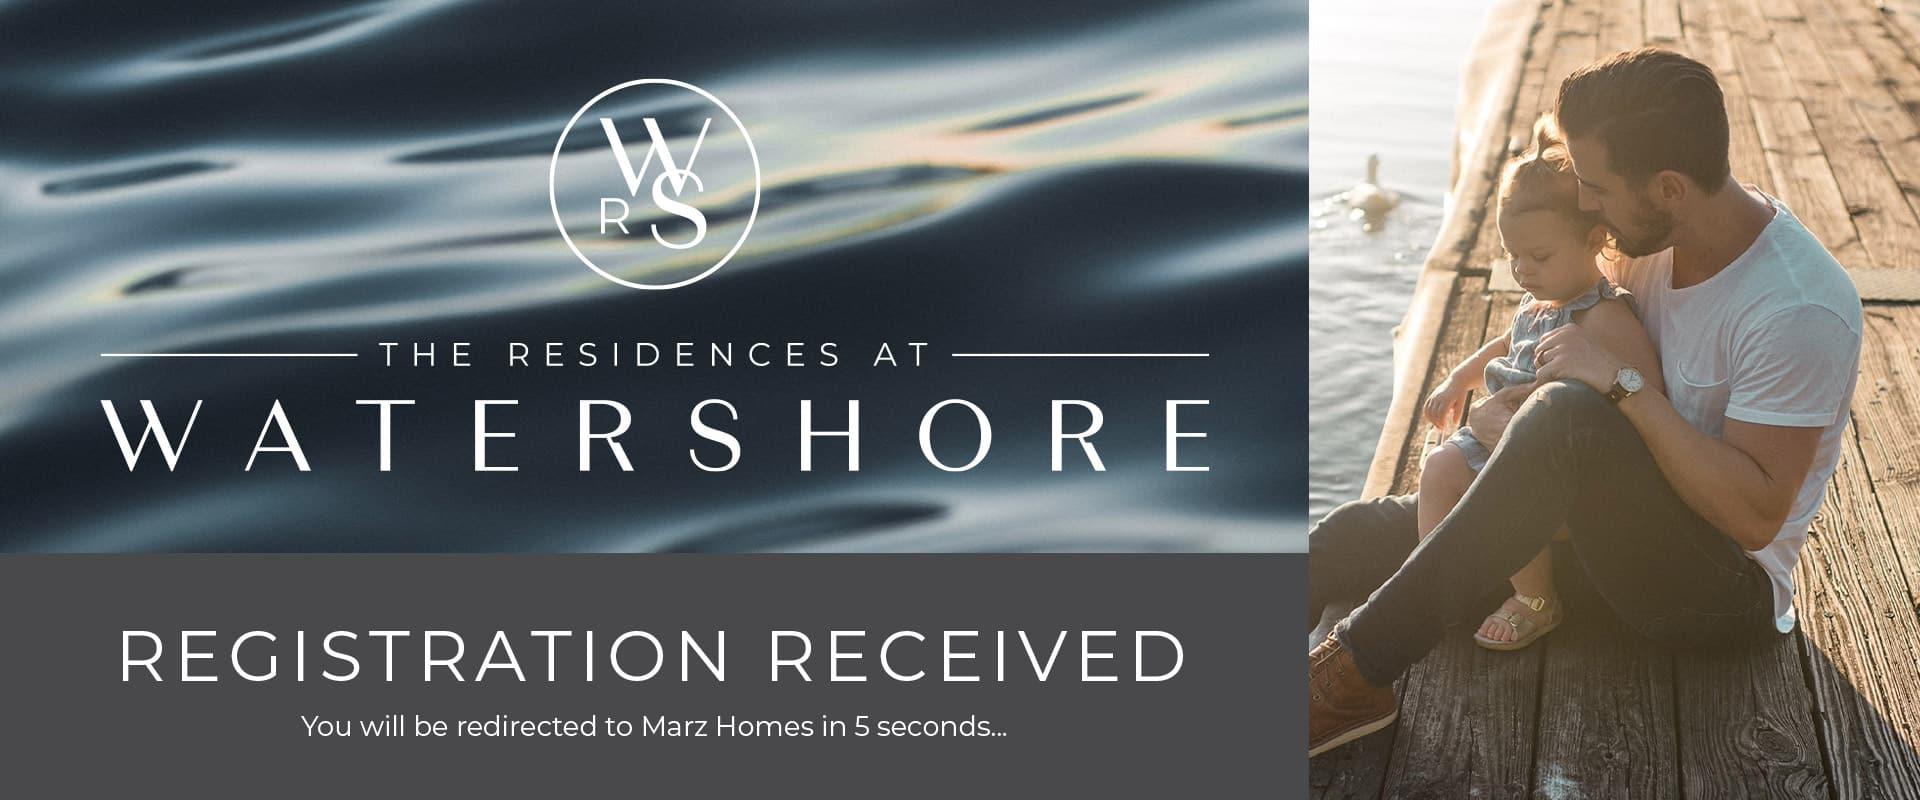 Watershore Registration Received